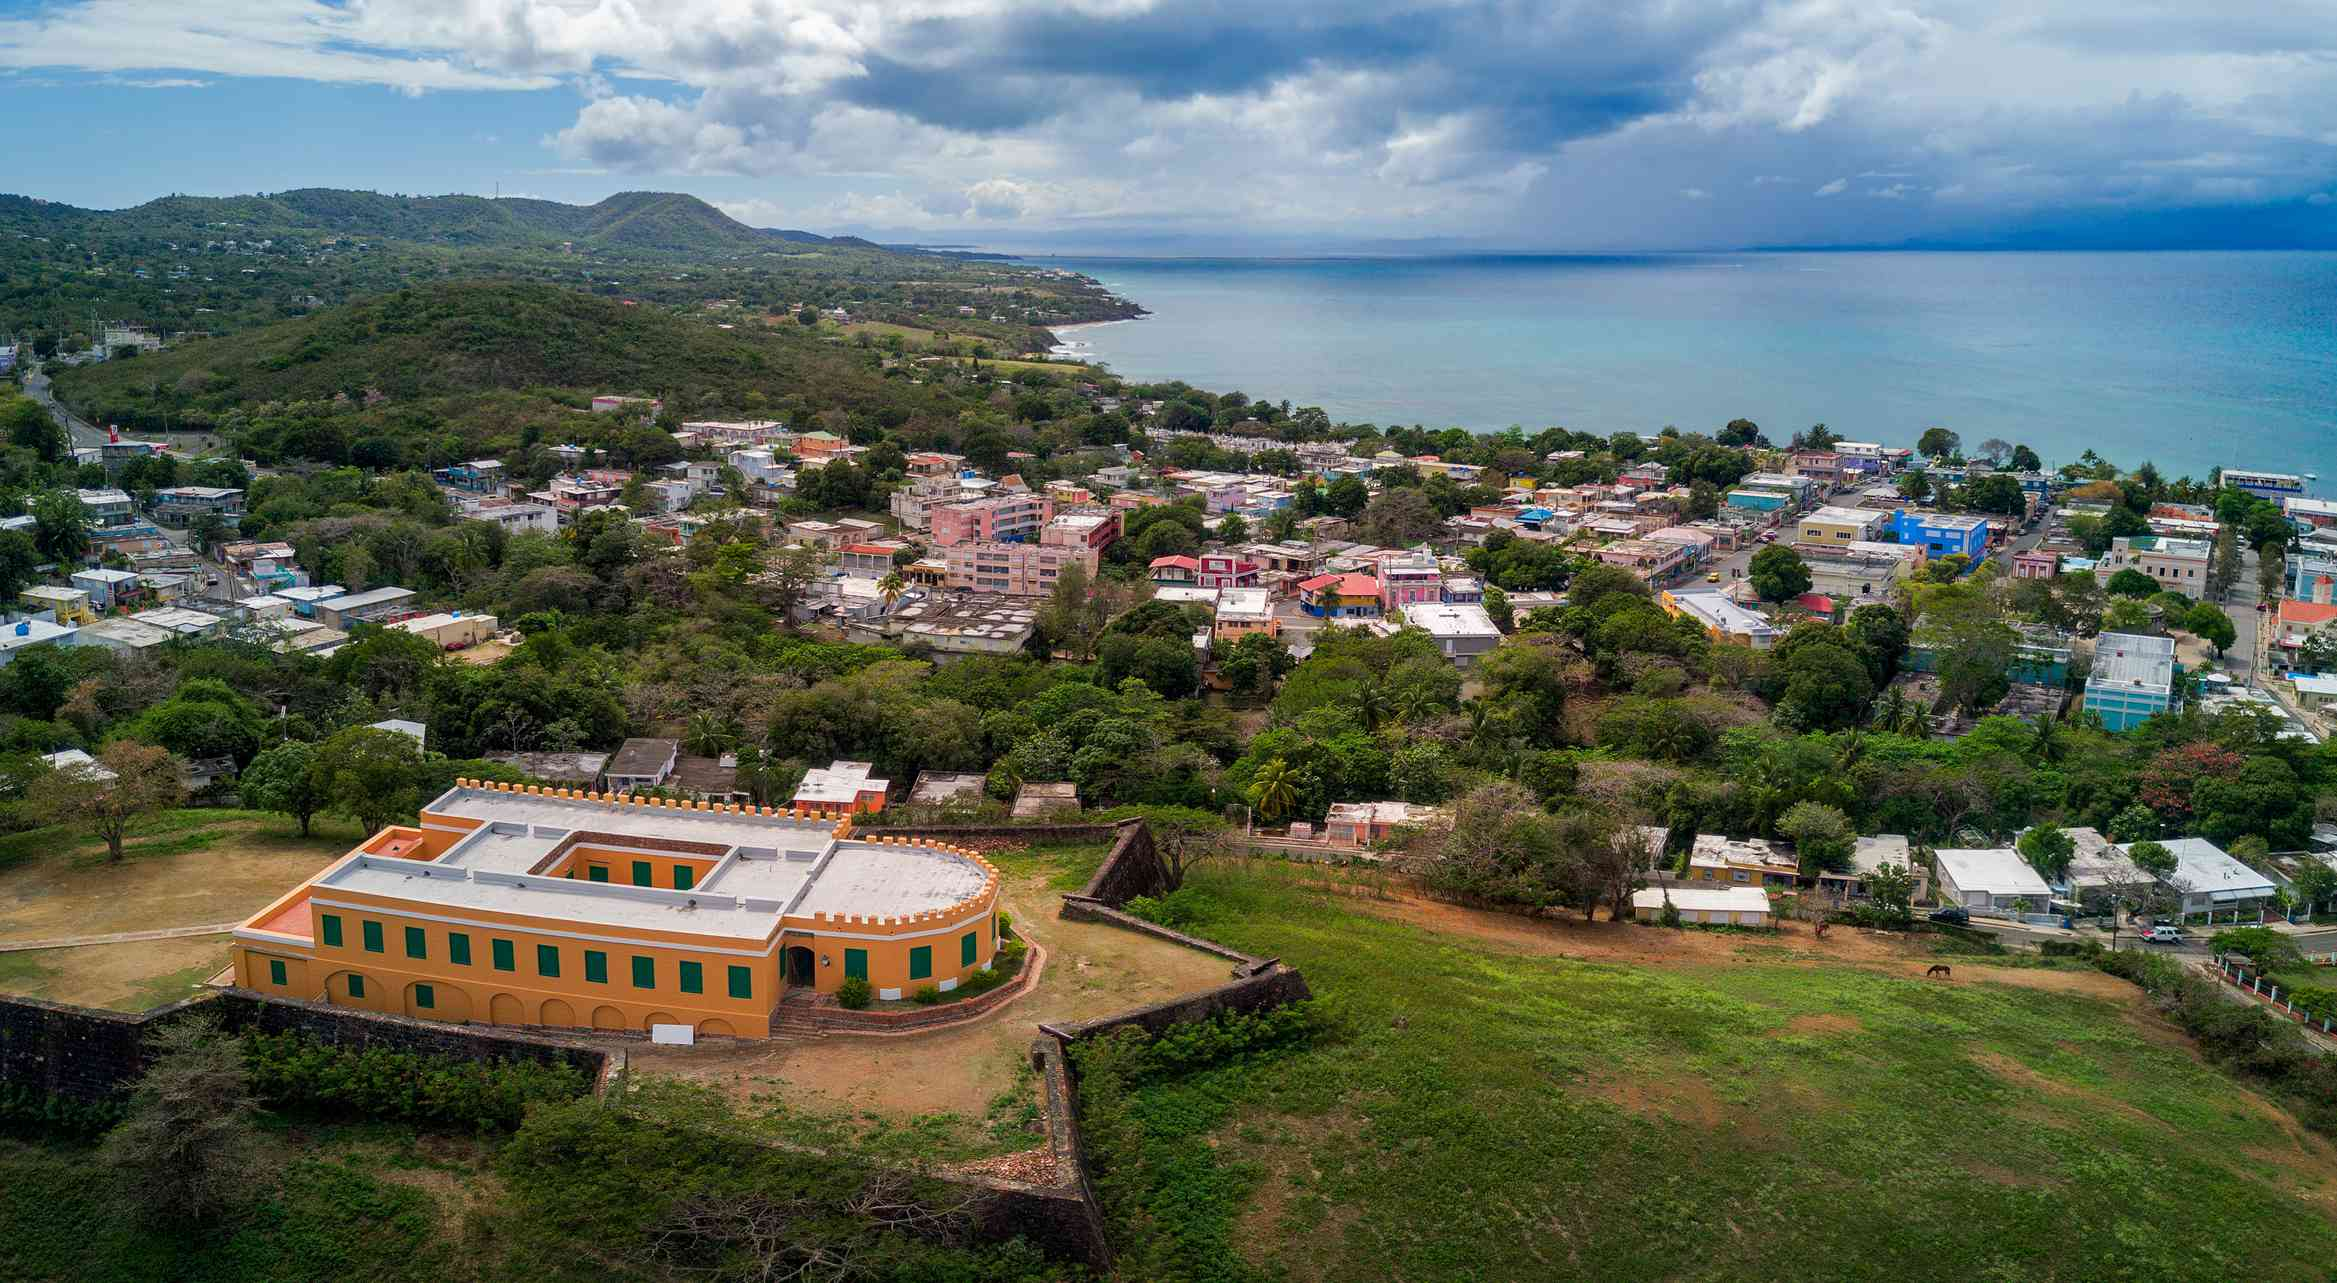 aerial photo Fuerte de Vieques